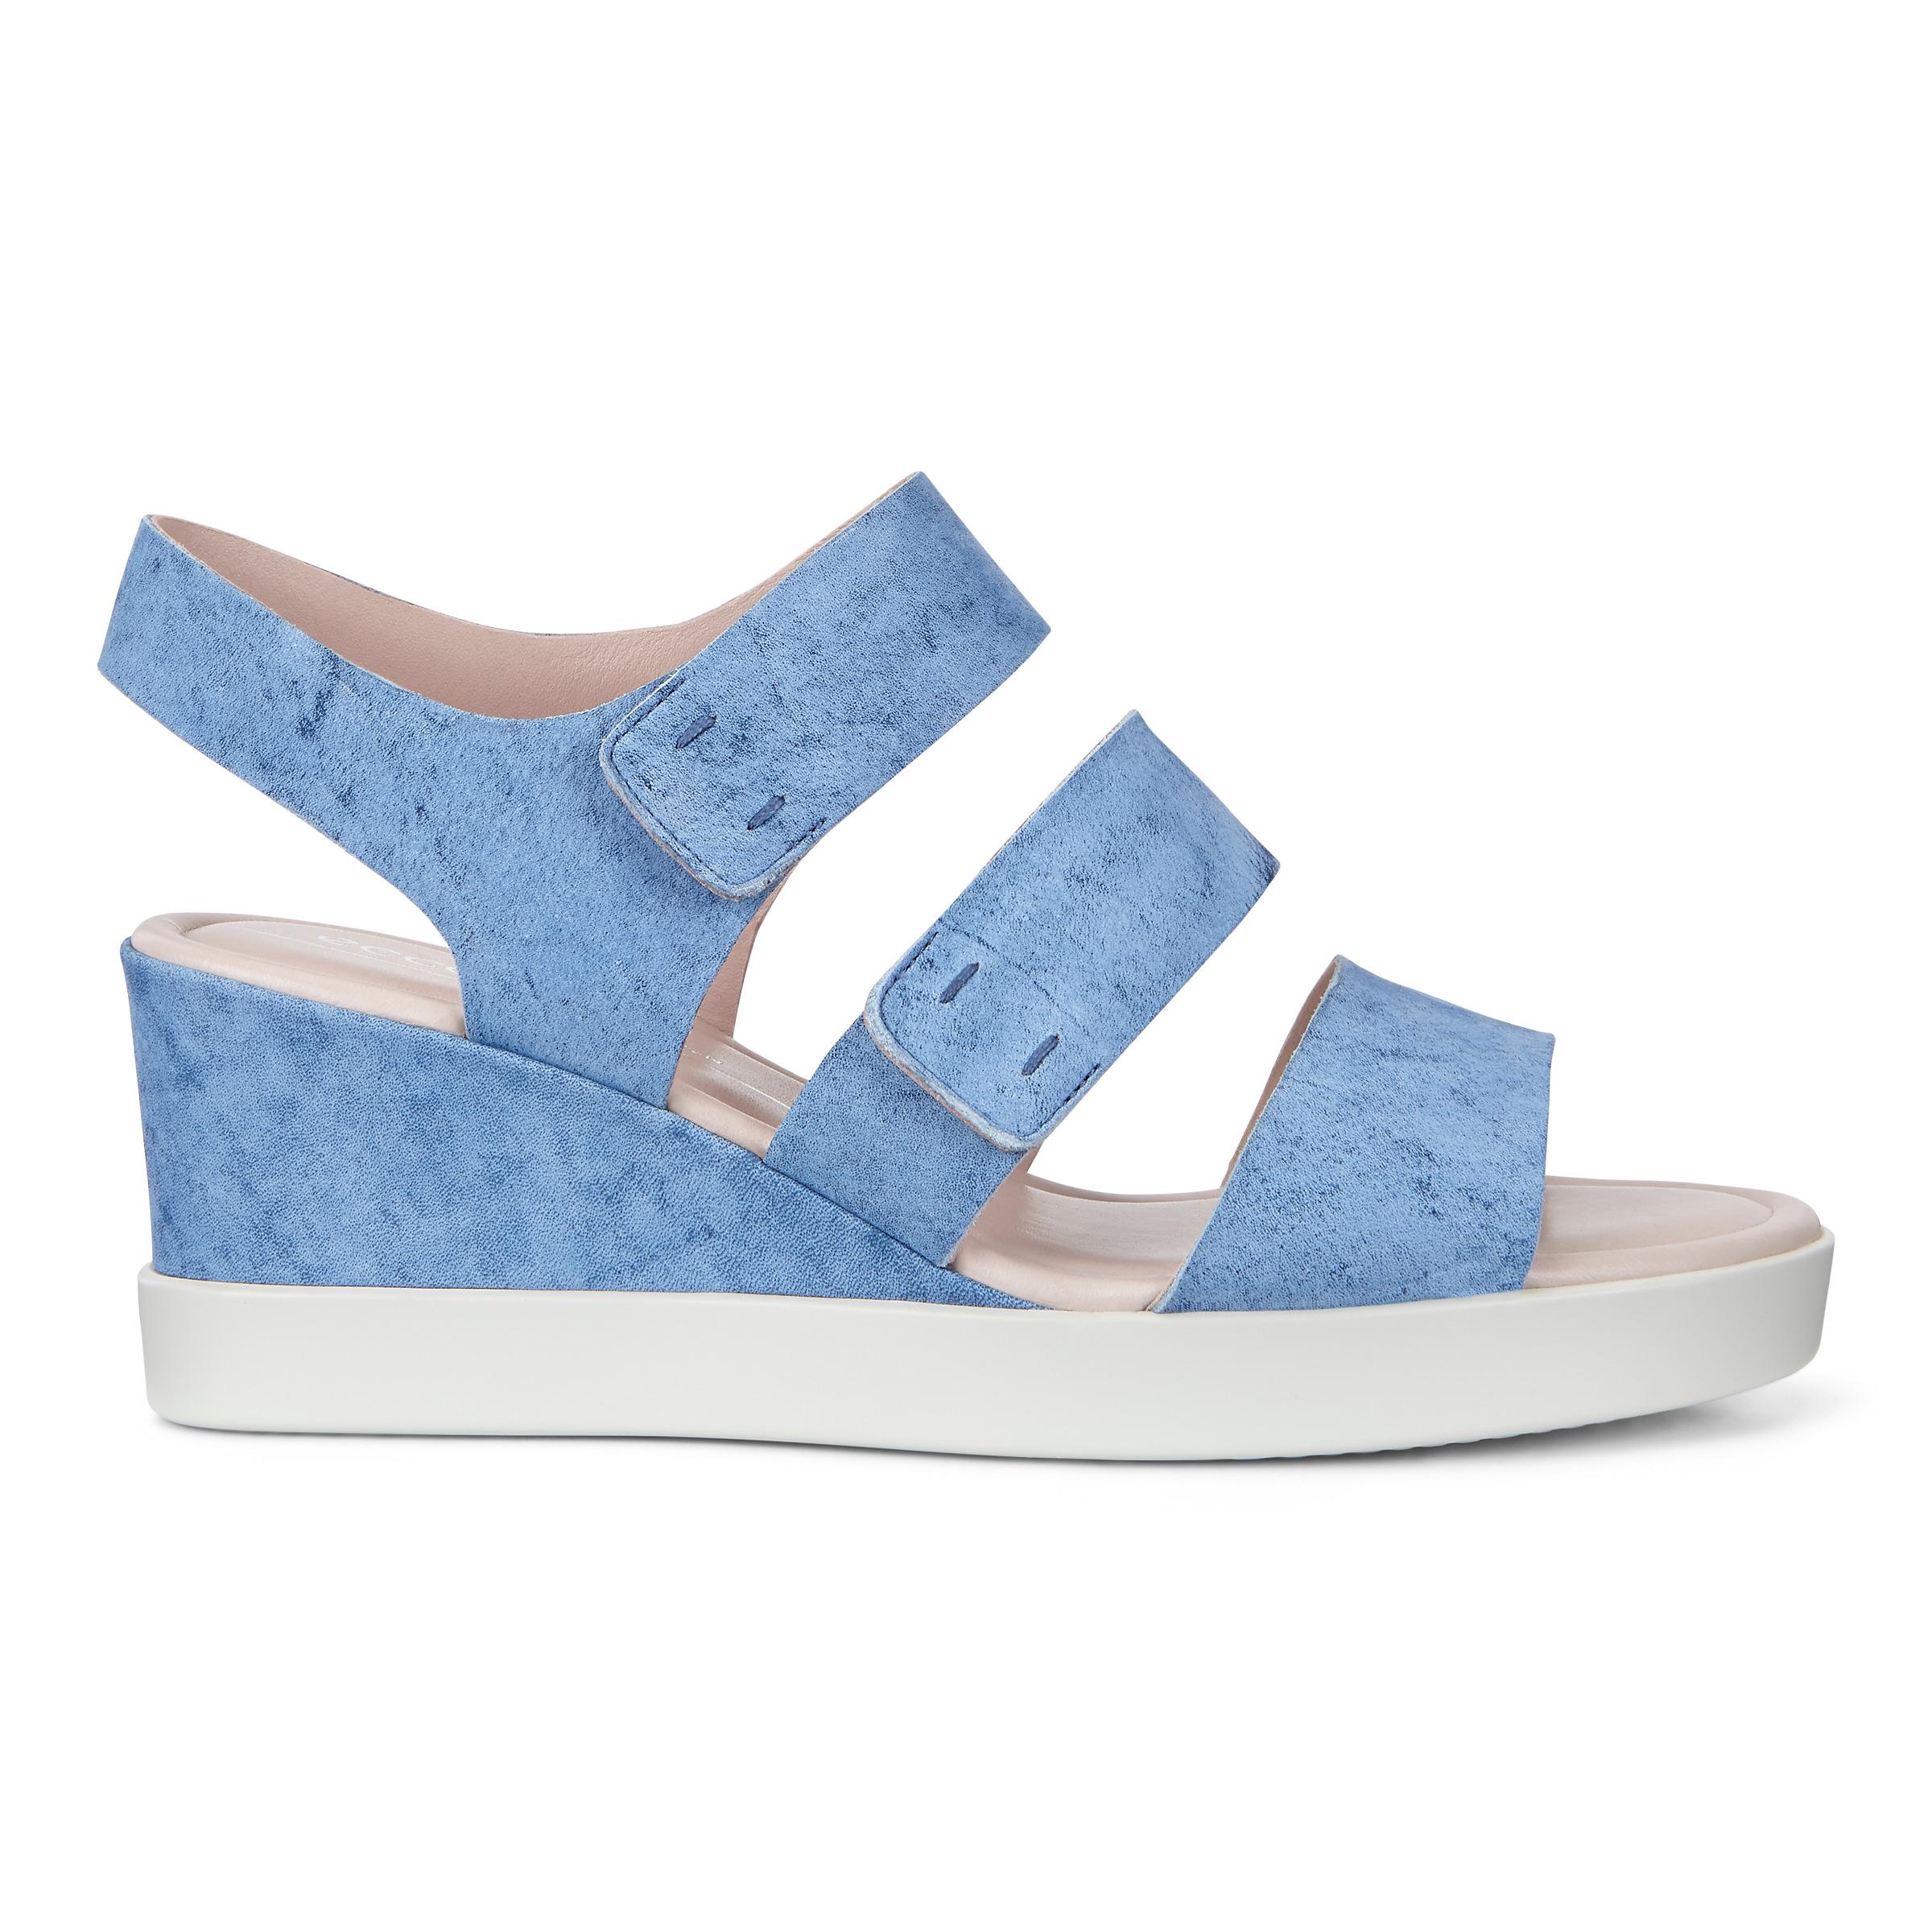 ECCO Shape Wedge Plateau Sandals Size 8-8.5 Indigo